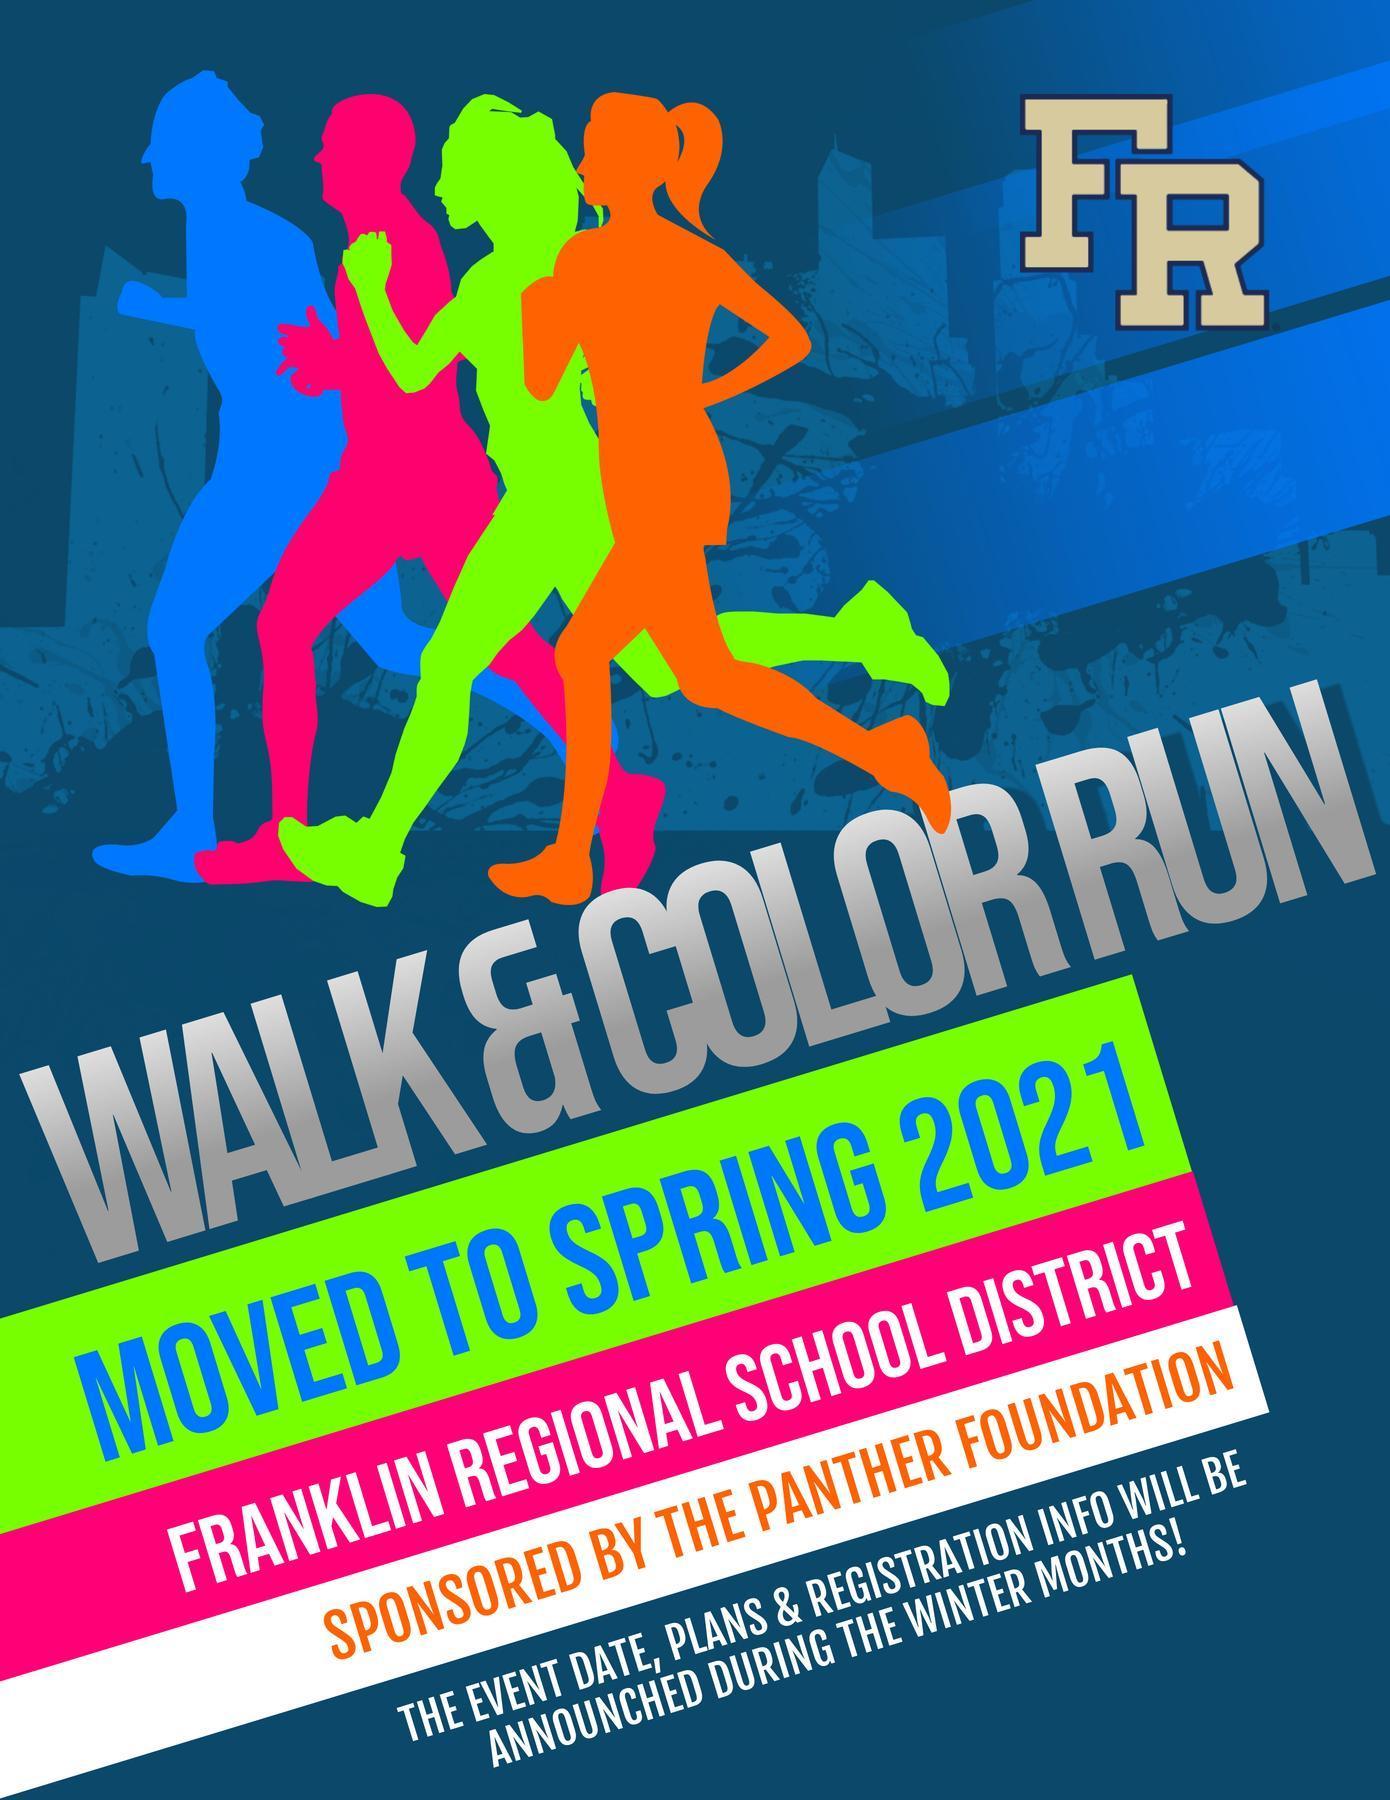 Spring 2021 Walk & Color Run